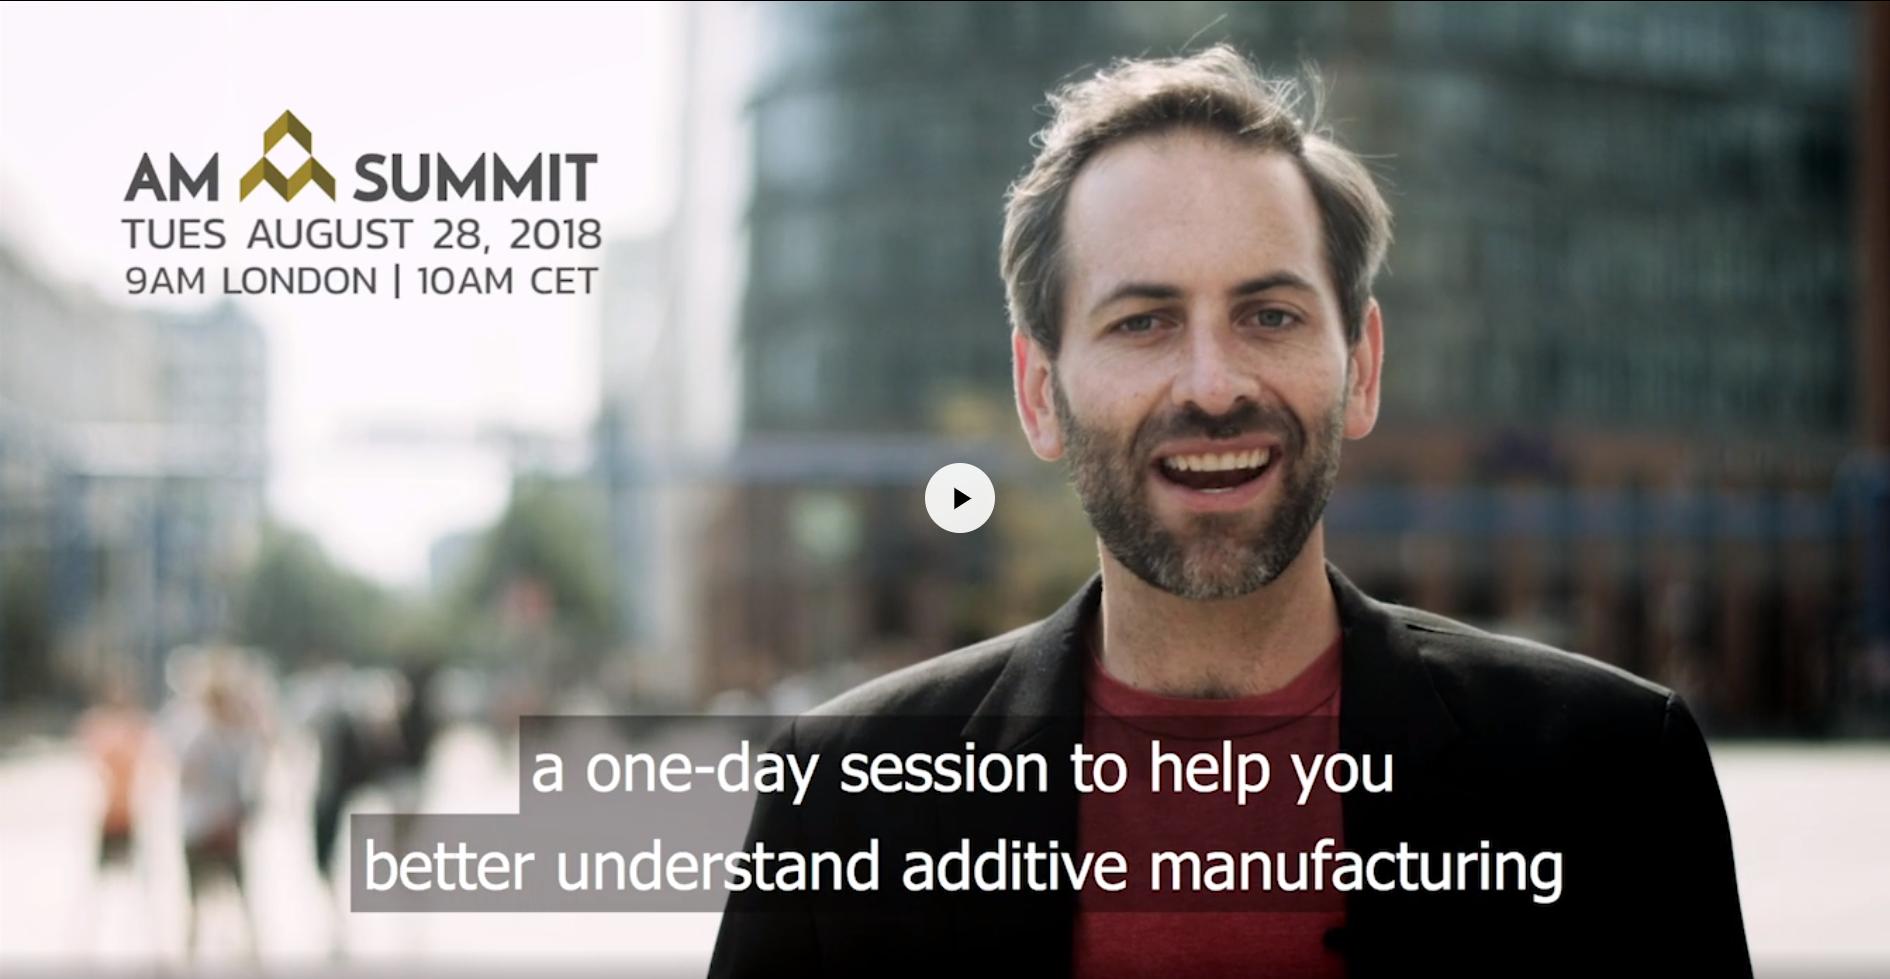 AM-Summit-video